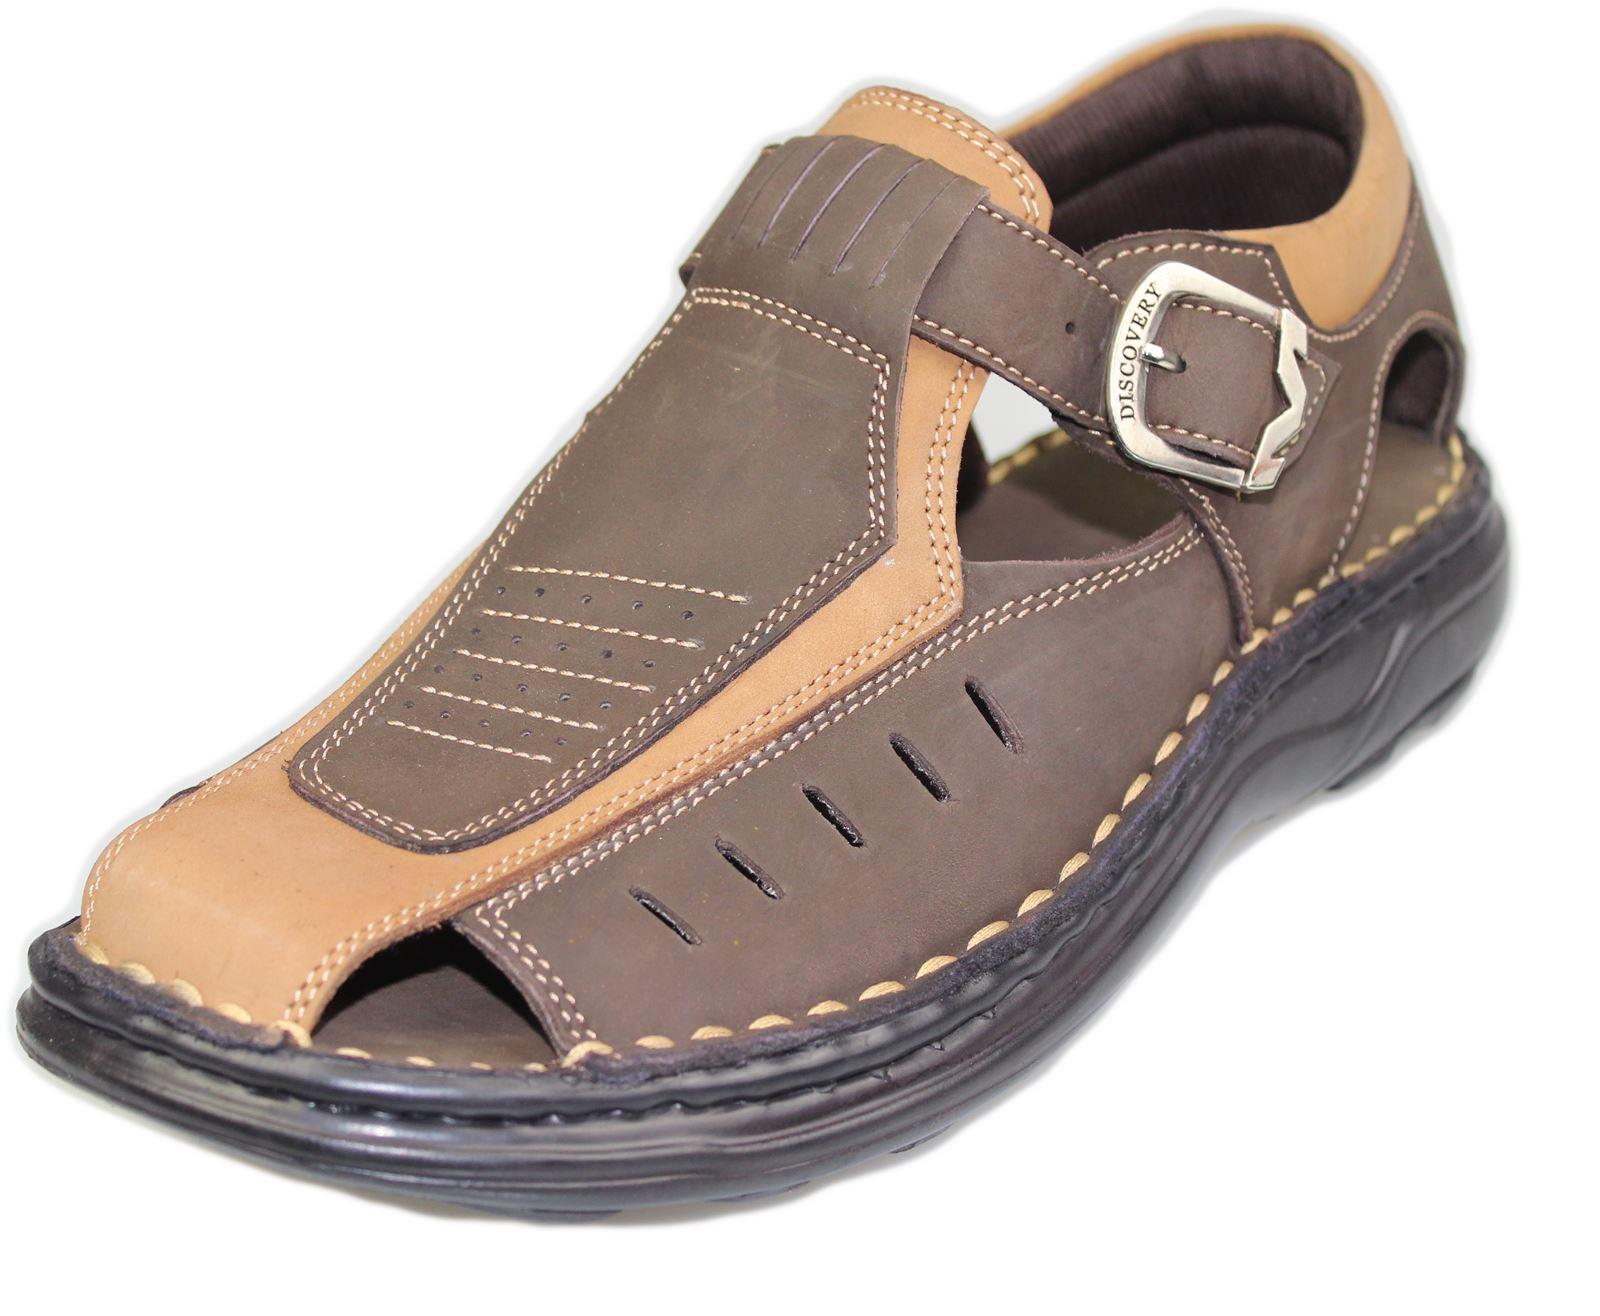 Mens-Buckle-Fastening-Sandals-Flat-Beach-Walking-Fashion-Casual-Summer-Slipper miniatura 12